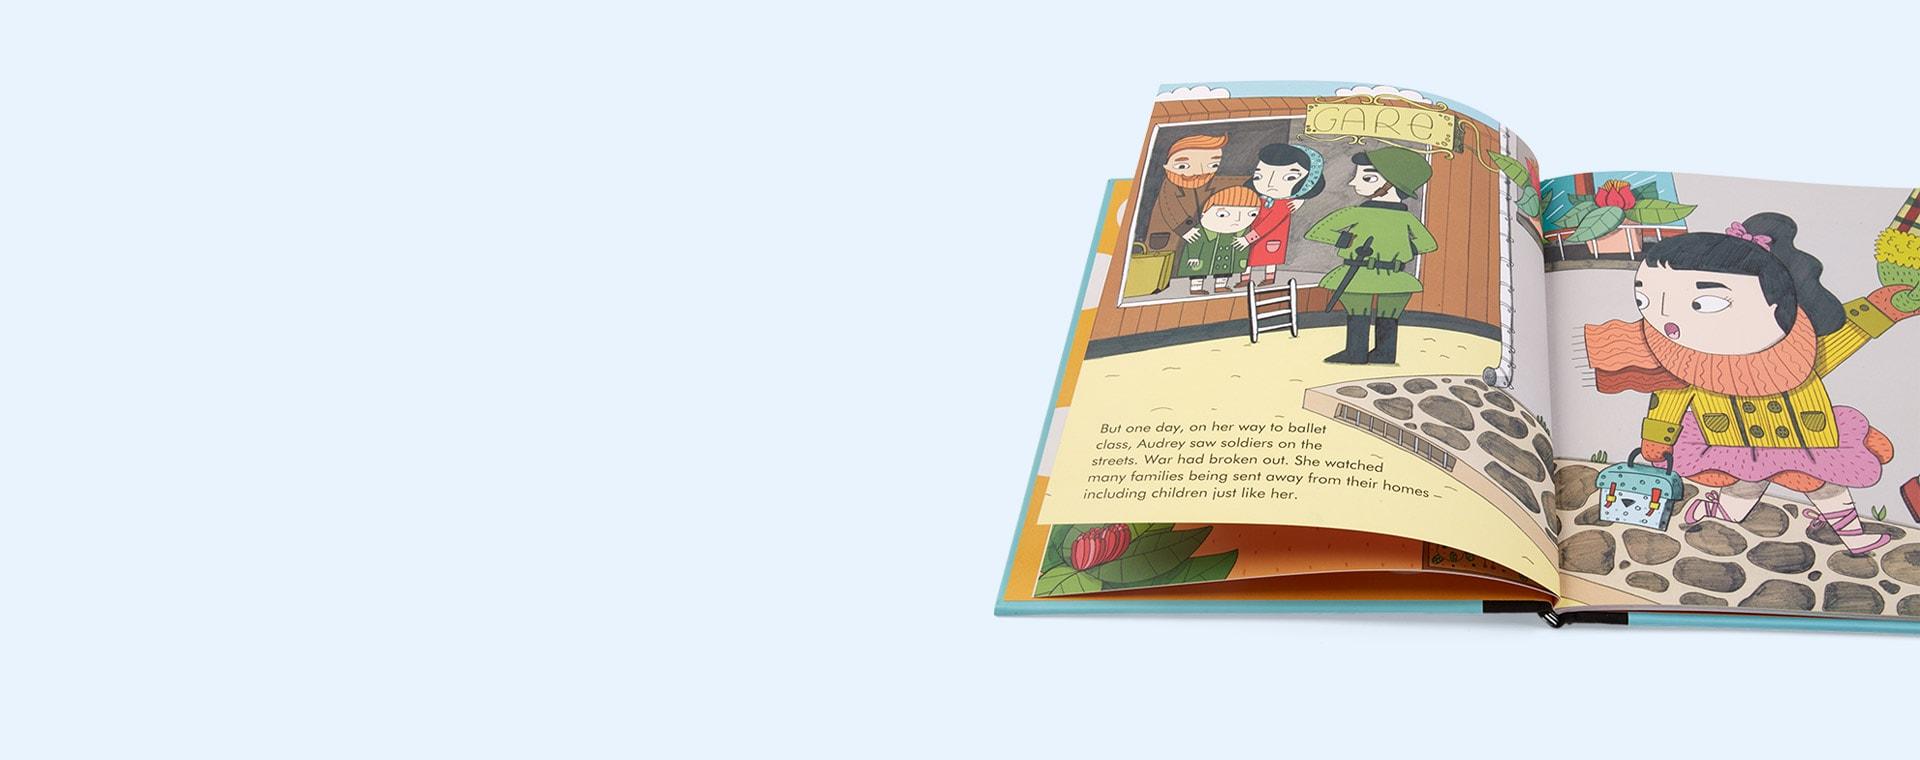 Blue bookspeed Little People Big Dreams Audrey Hepburn